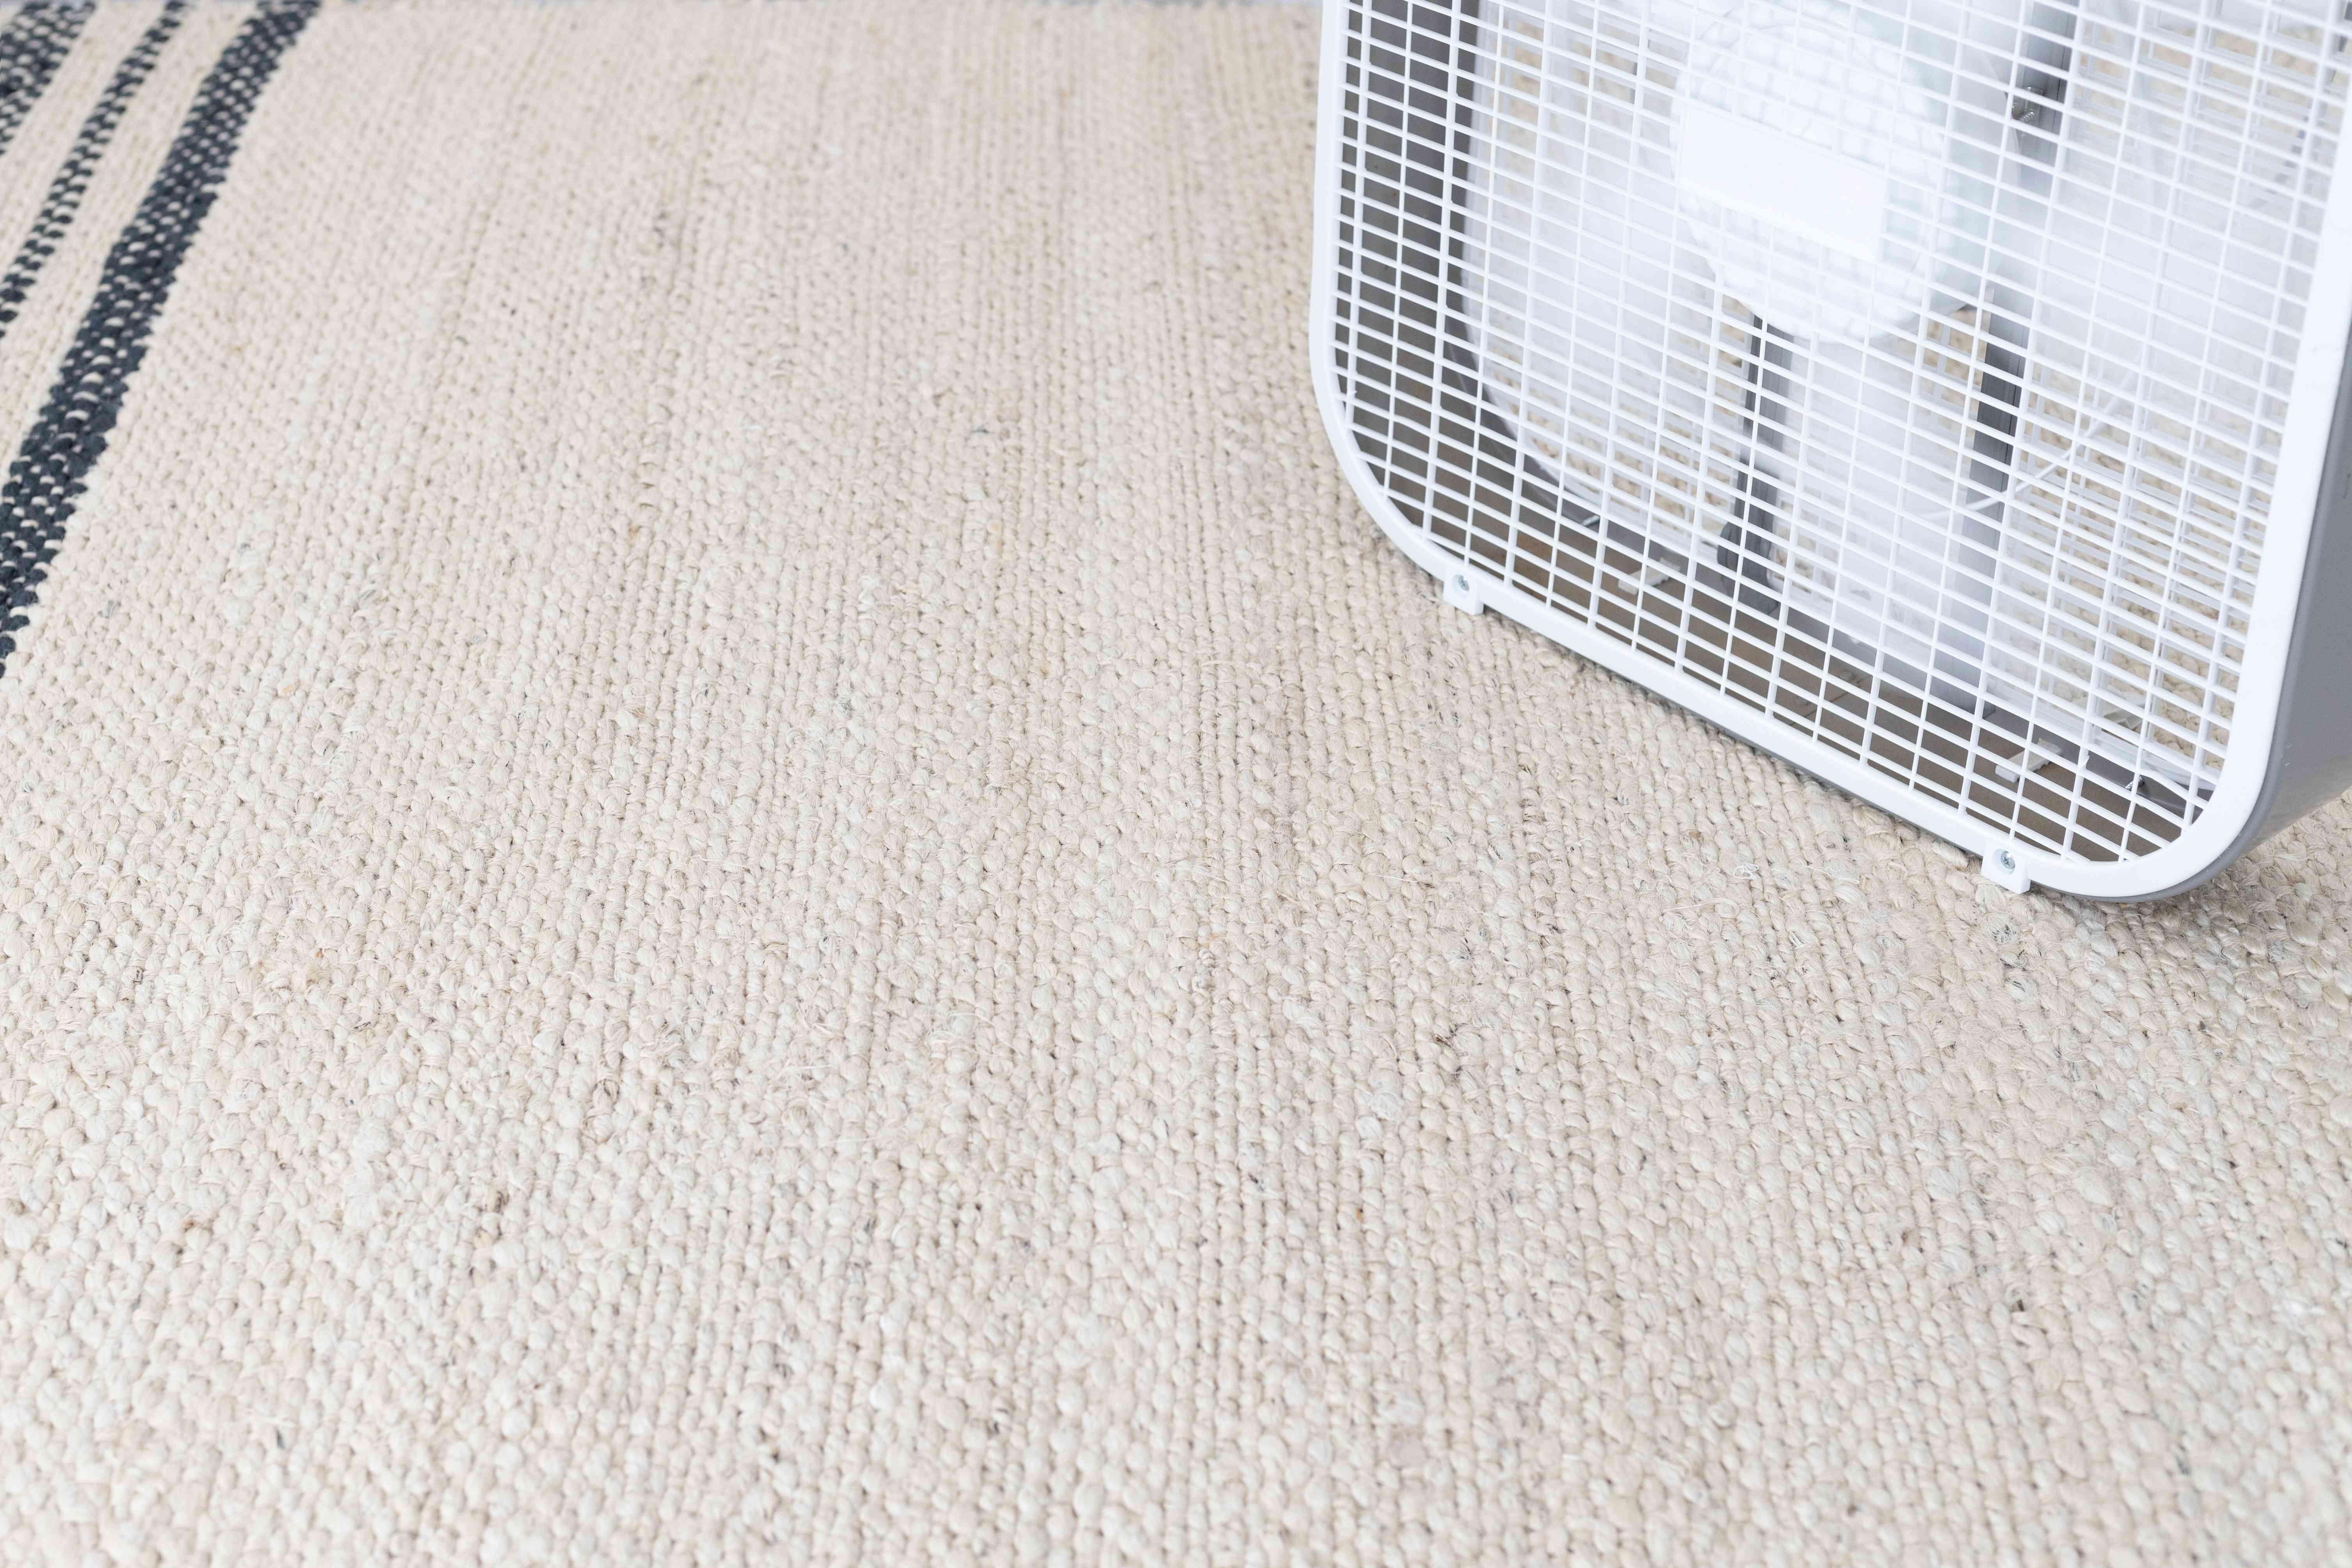 Fan air drying carpet